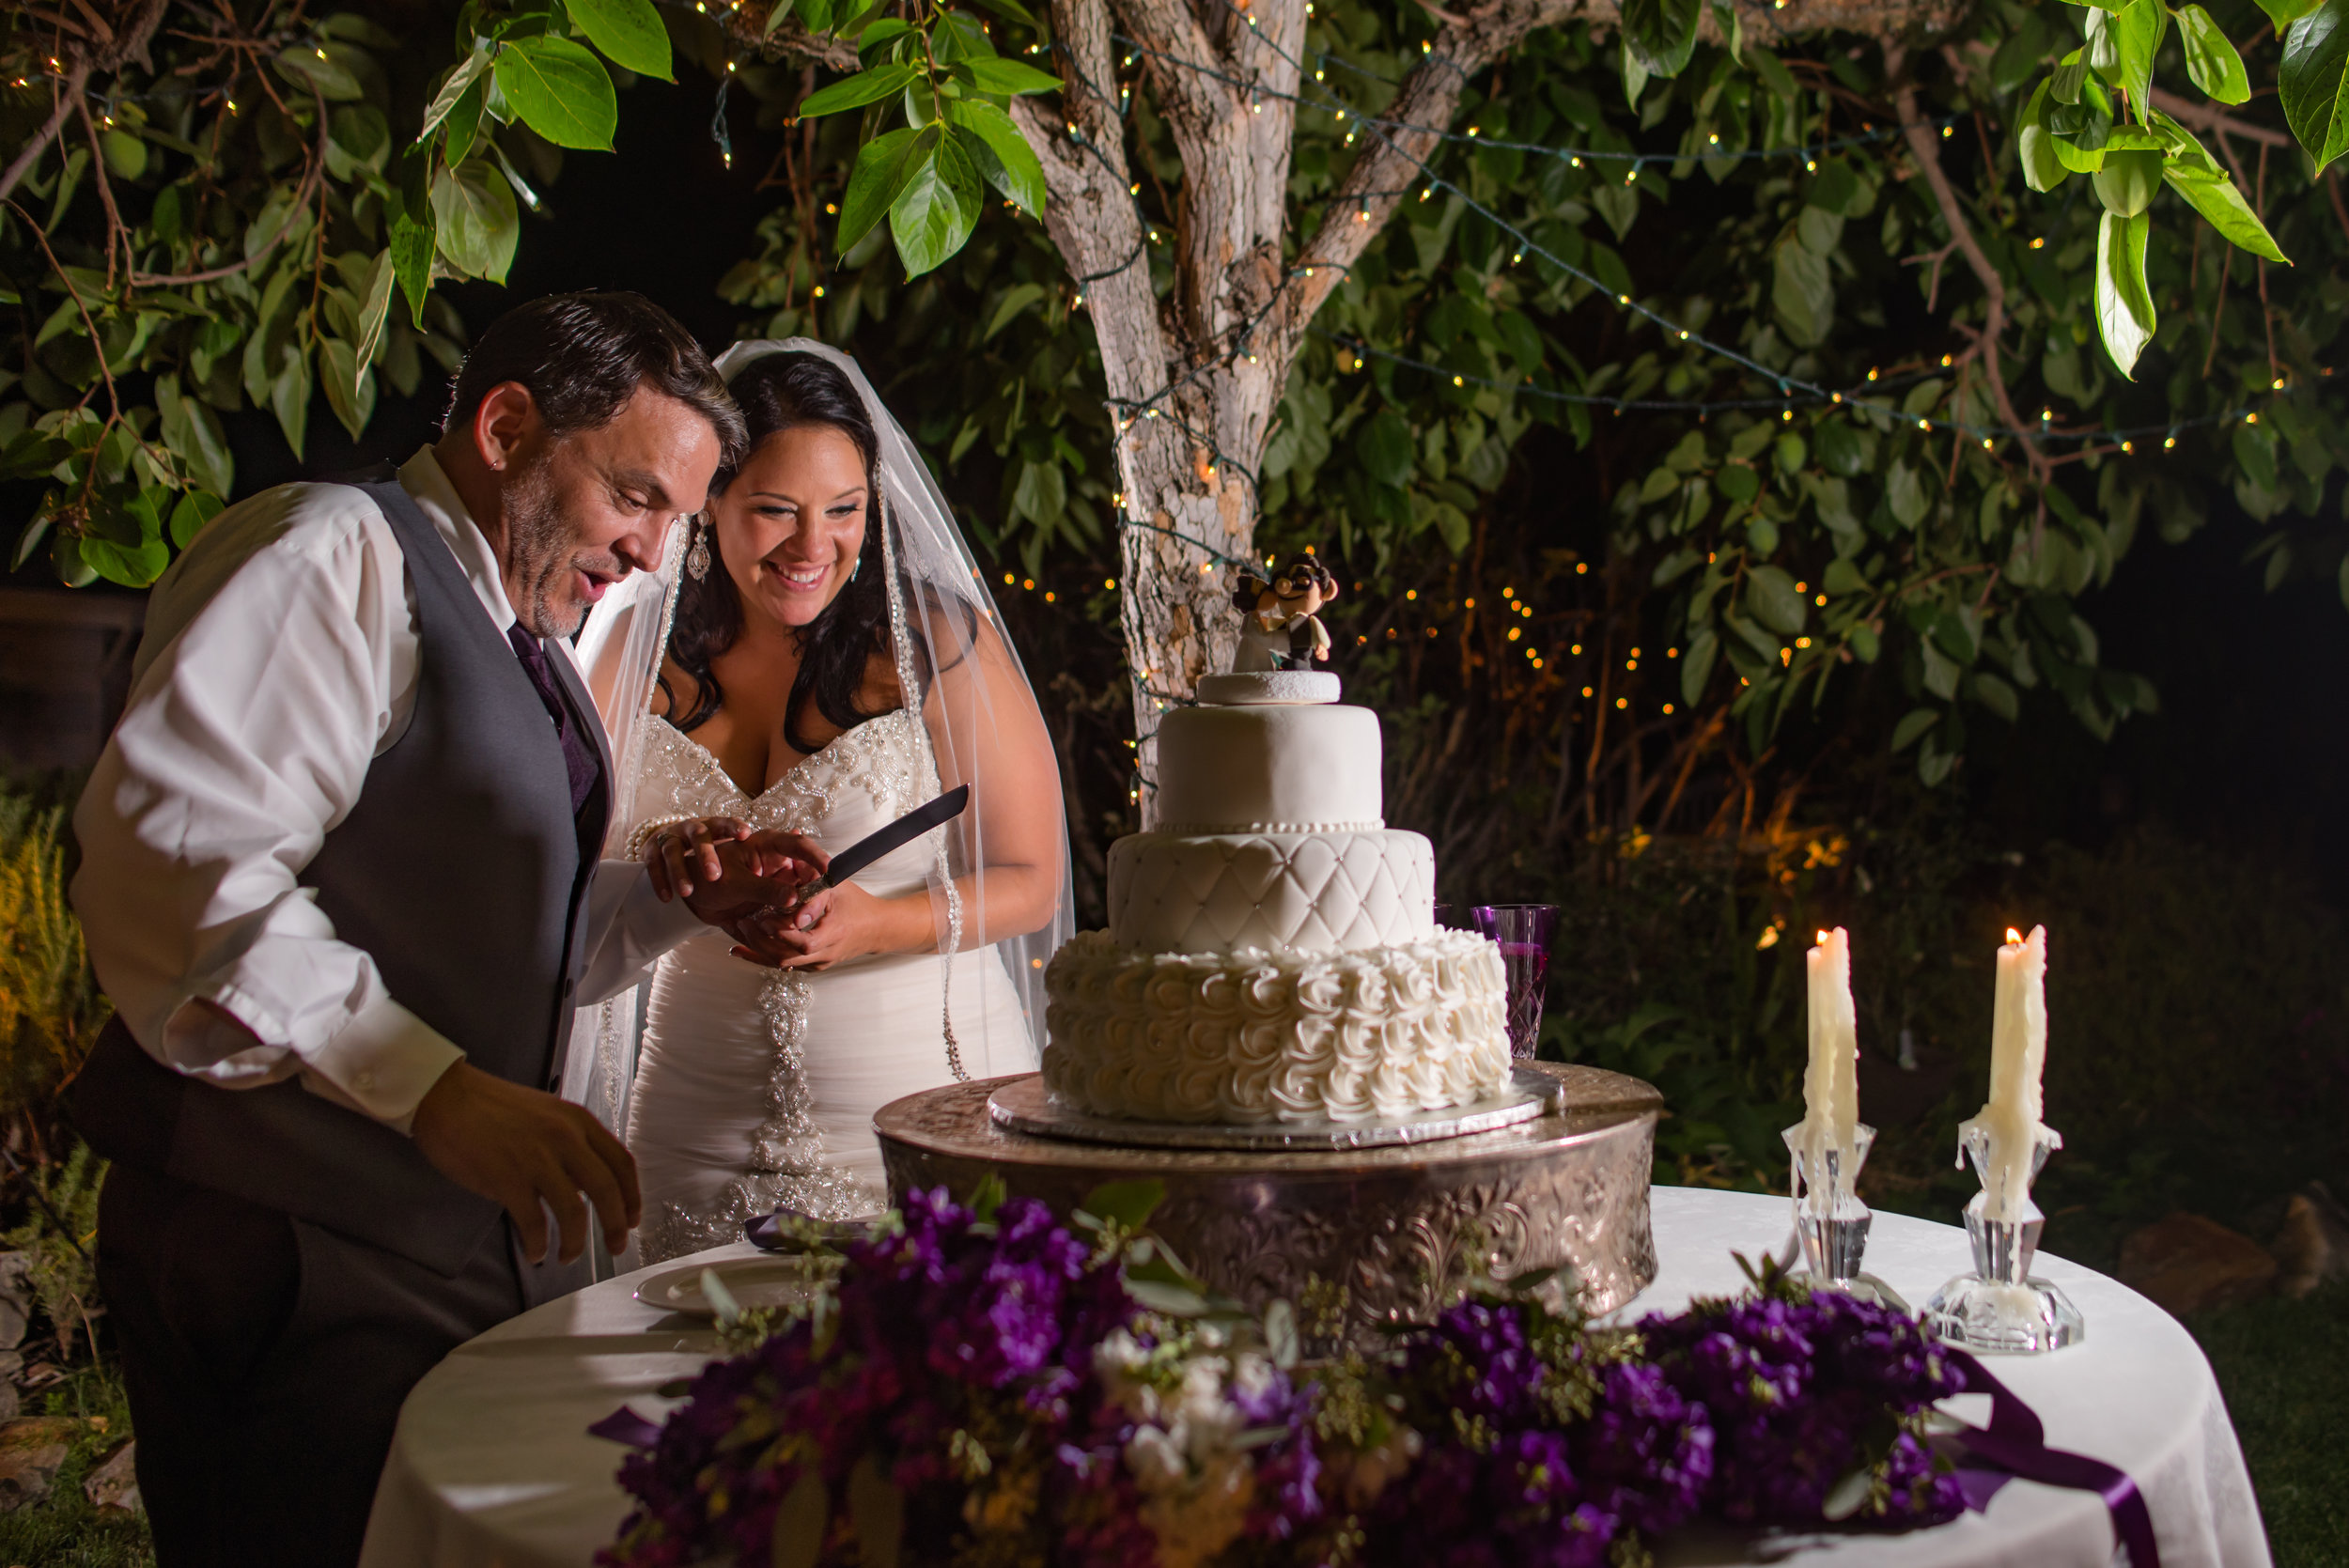 erika-seth-033-monte-verde-inn-sacramento-wedding-photographer-katherine-nicole-photography.JPG